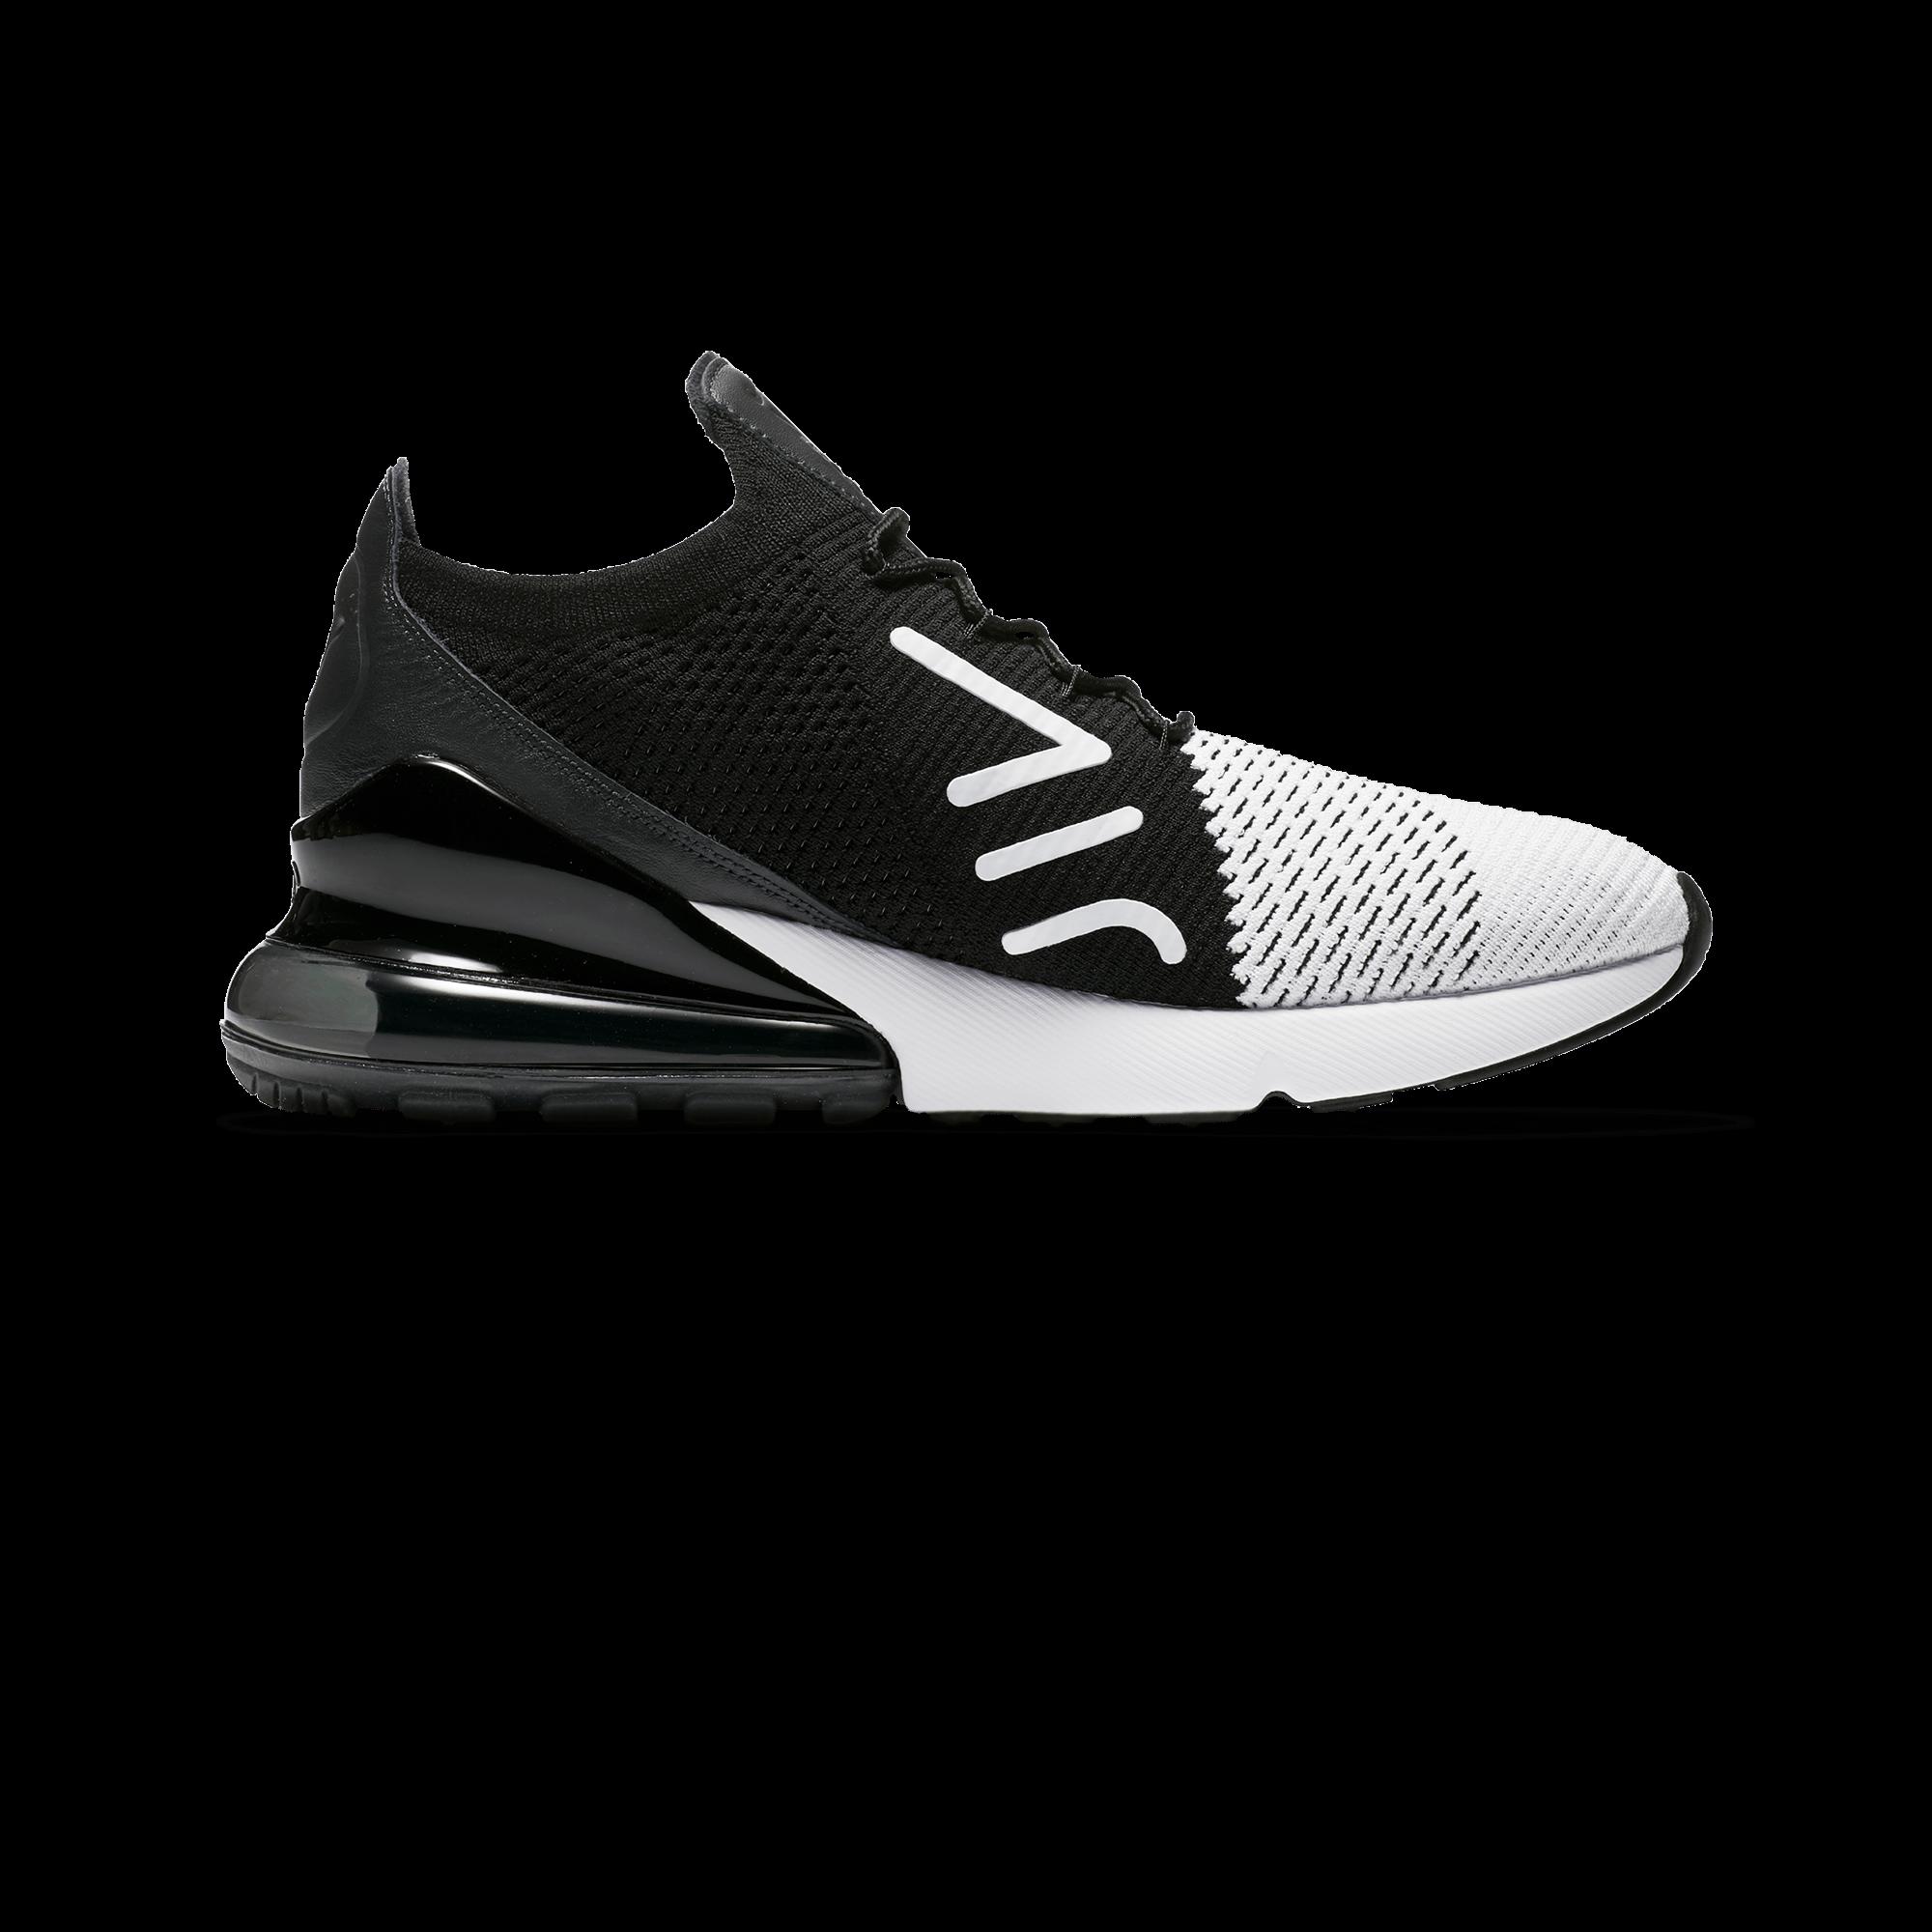 421d090c79c Nike Air Max 270 Flyknit white   black   anthracite - Men ...